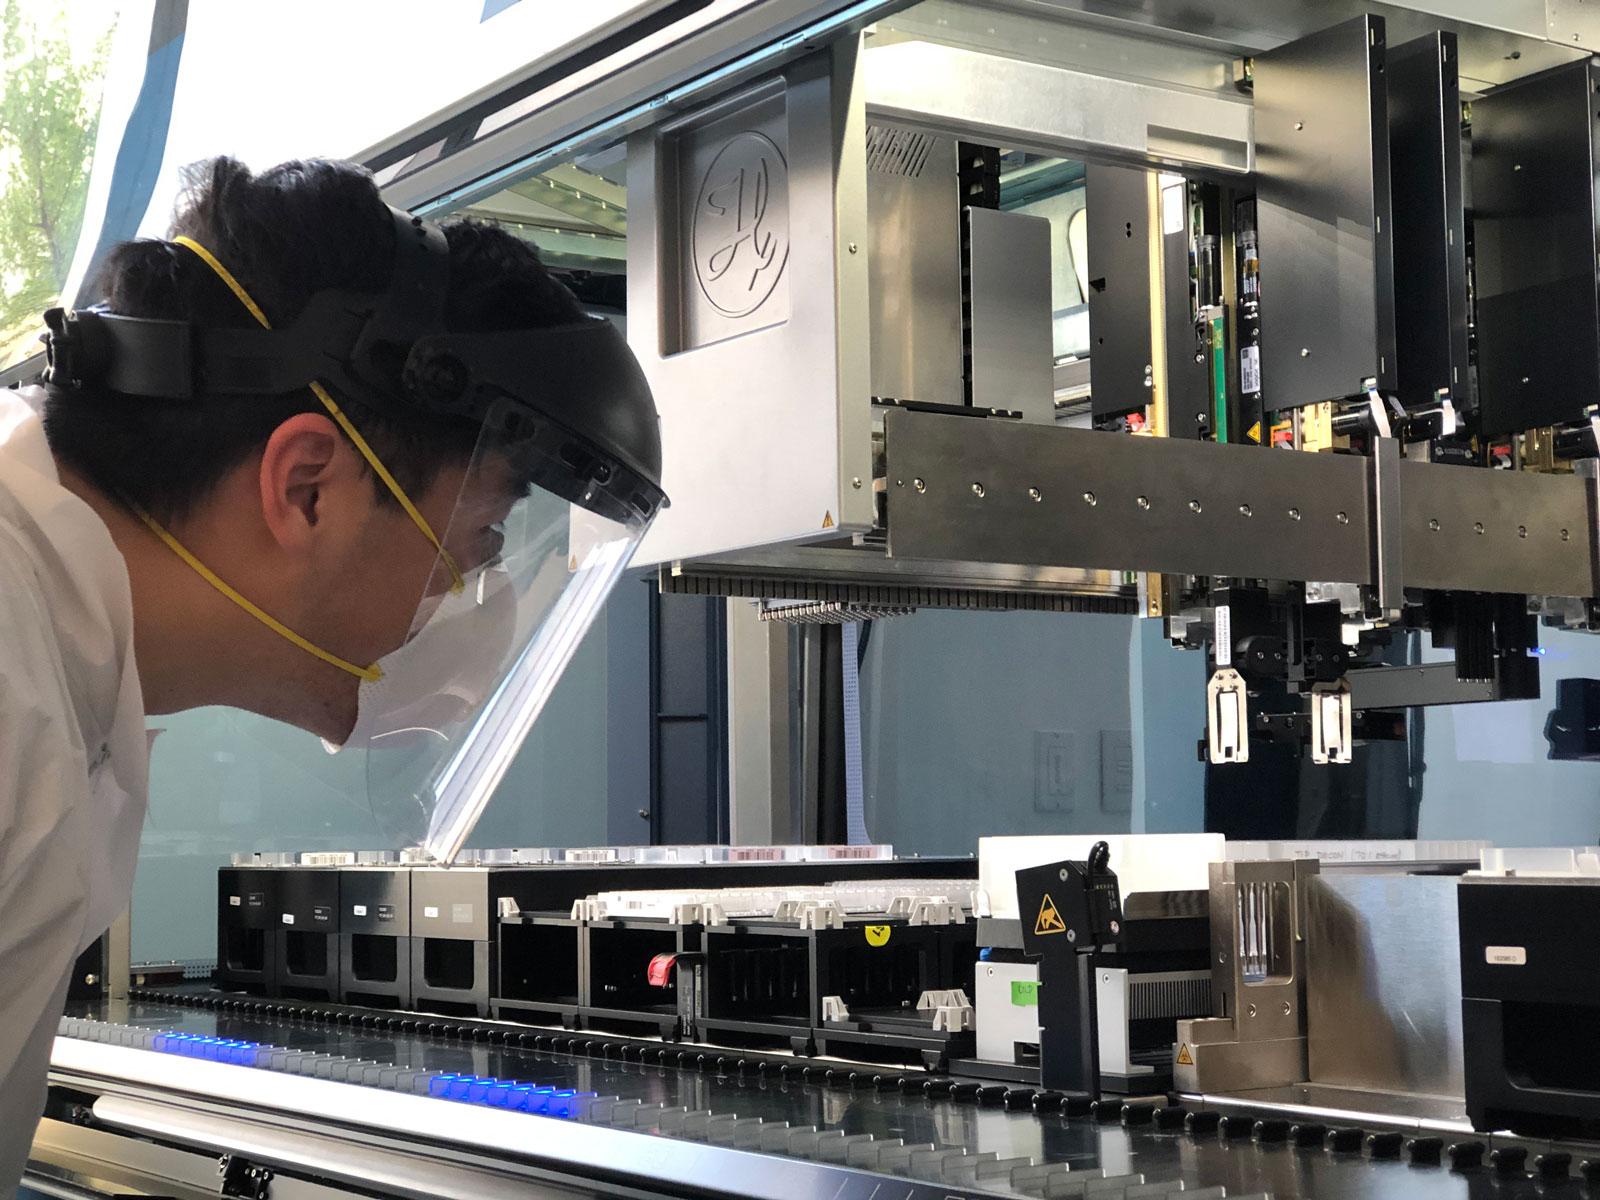 Connor Tsuchida working in Doudna's lab